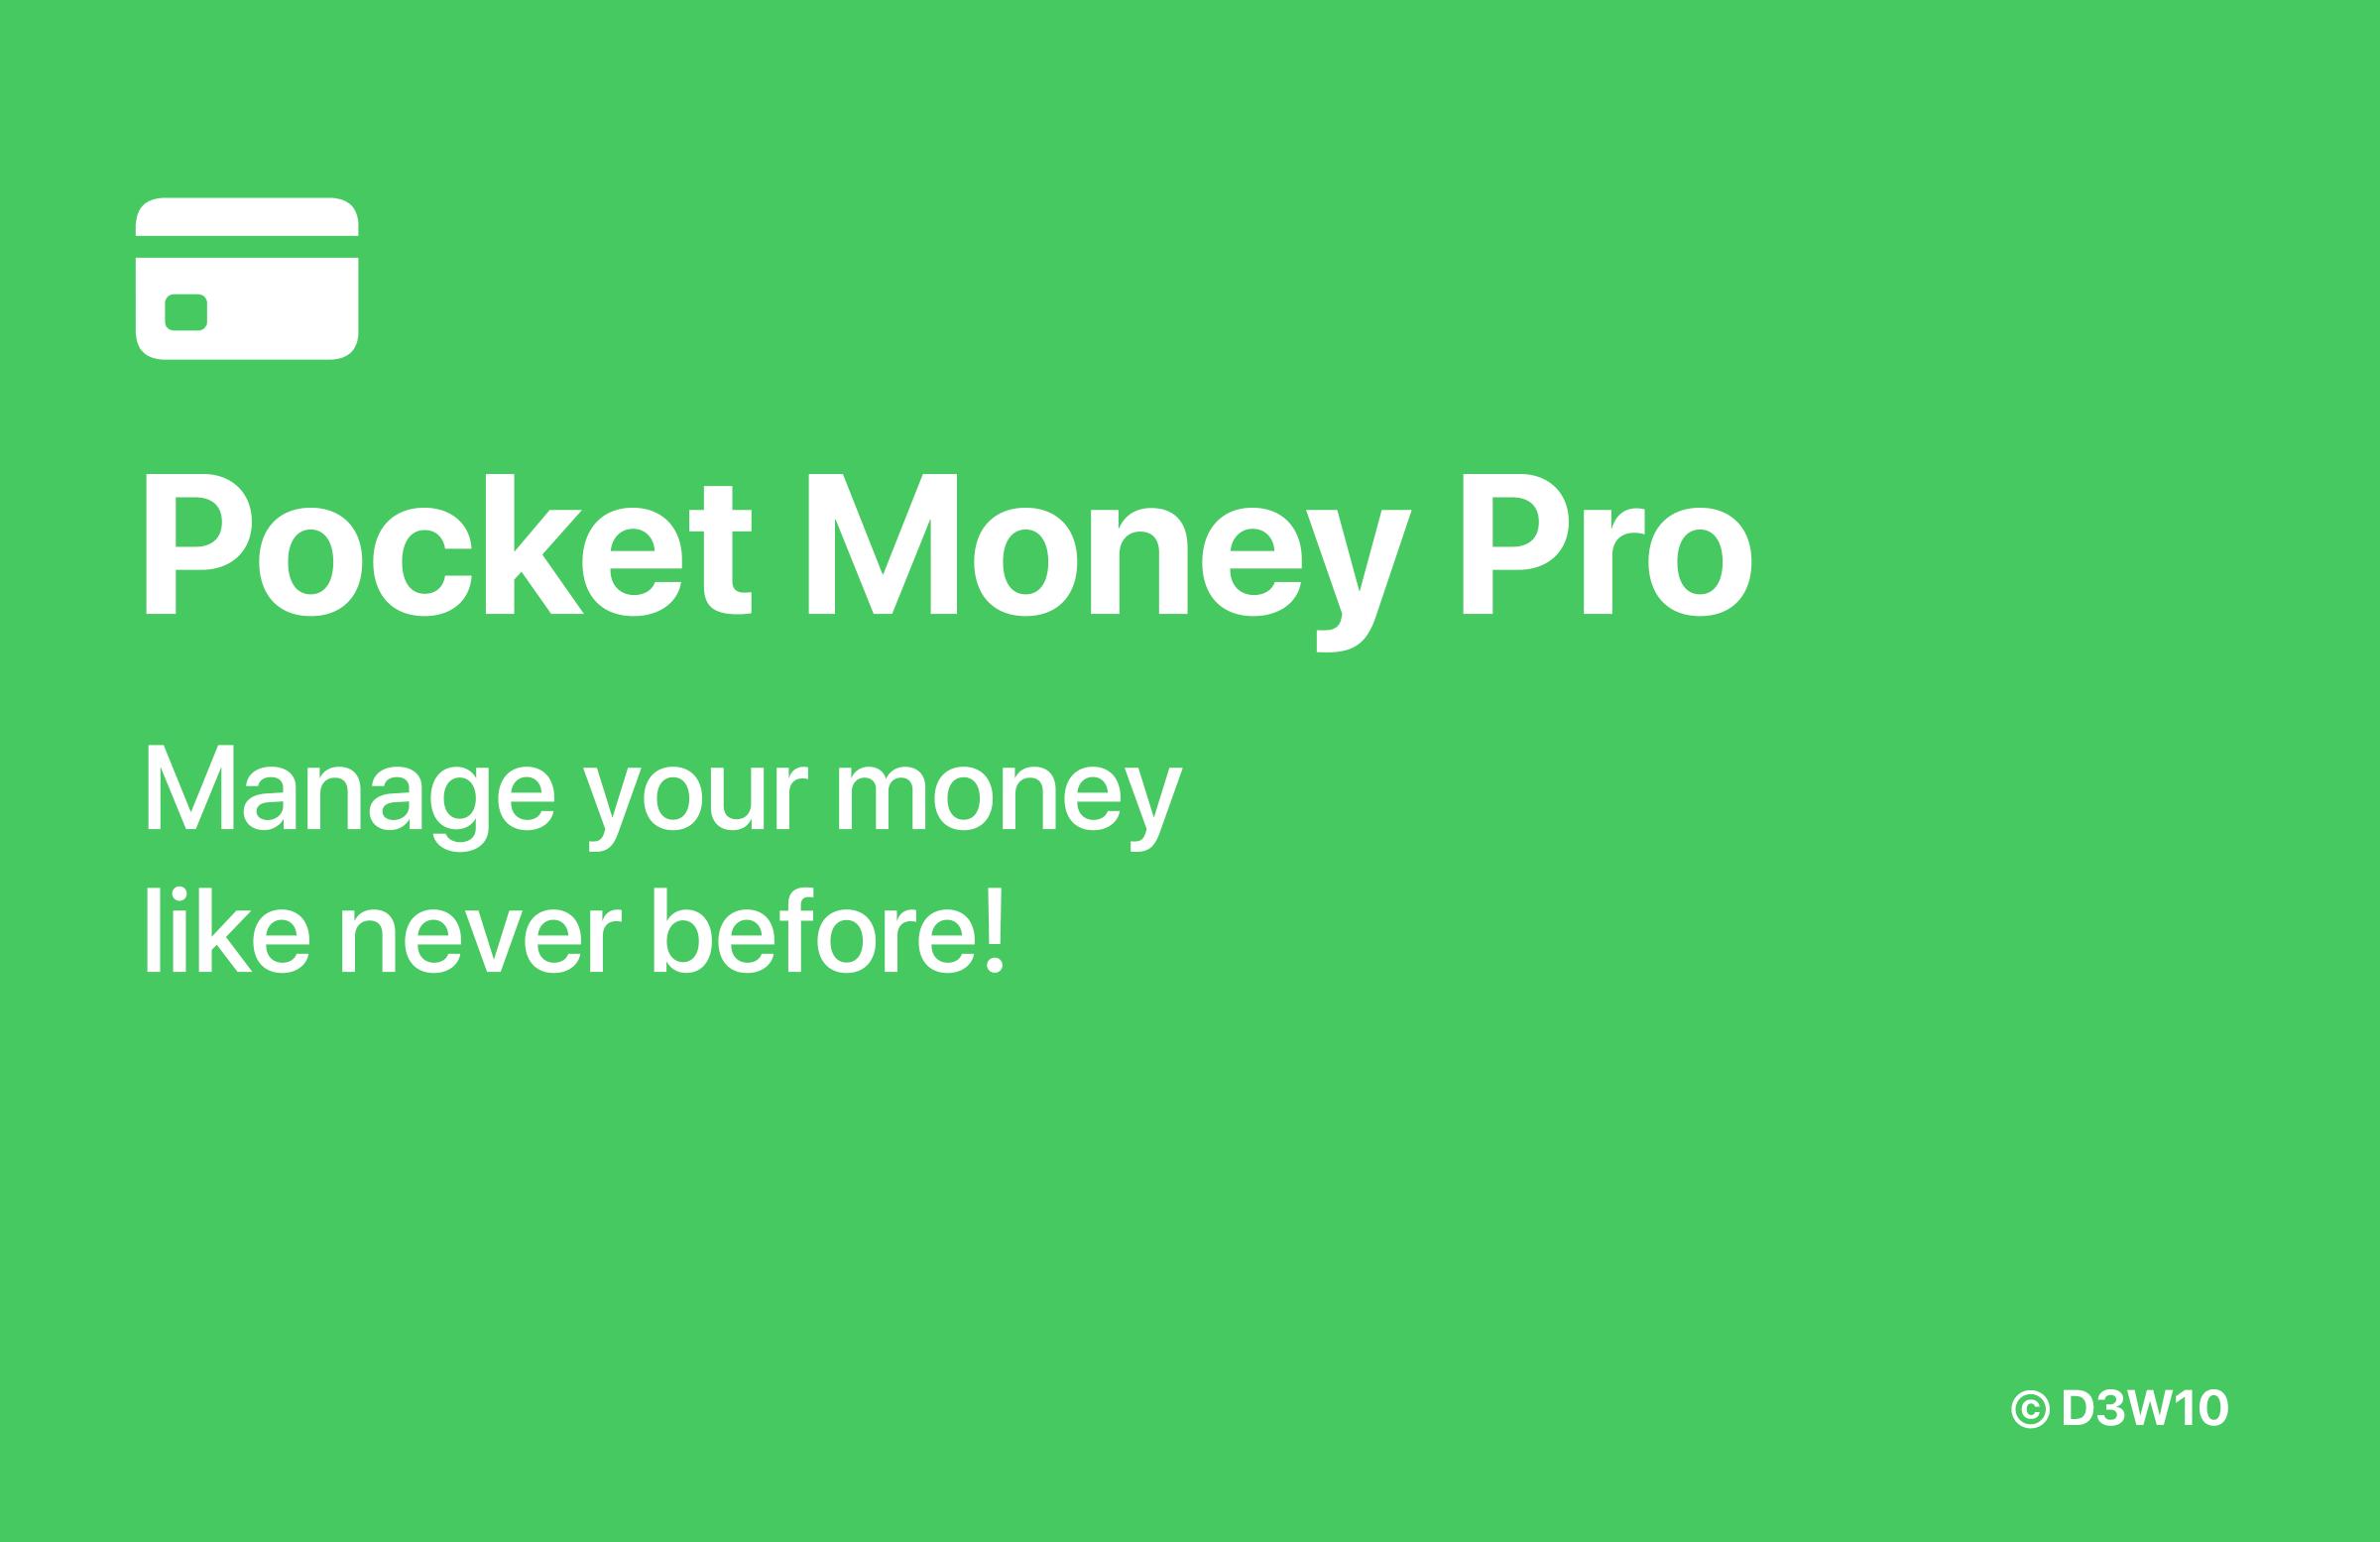 Pocket Money Pro Banner